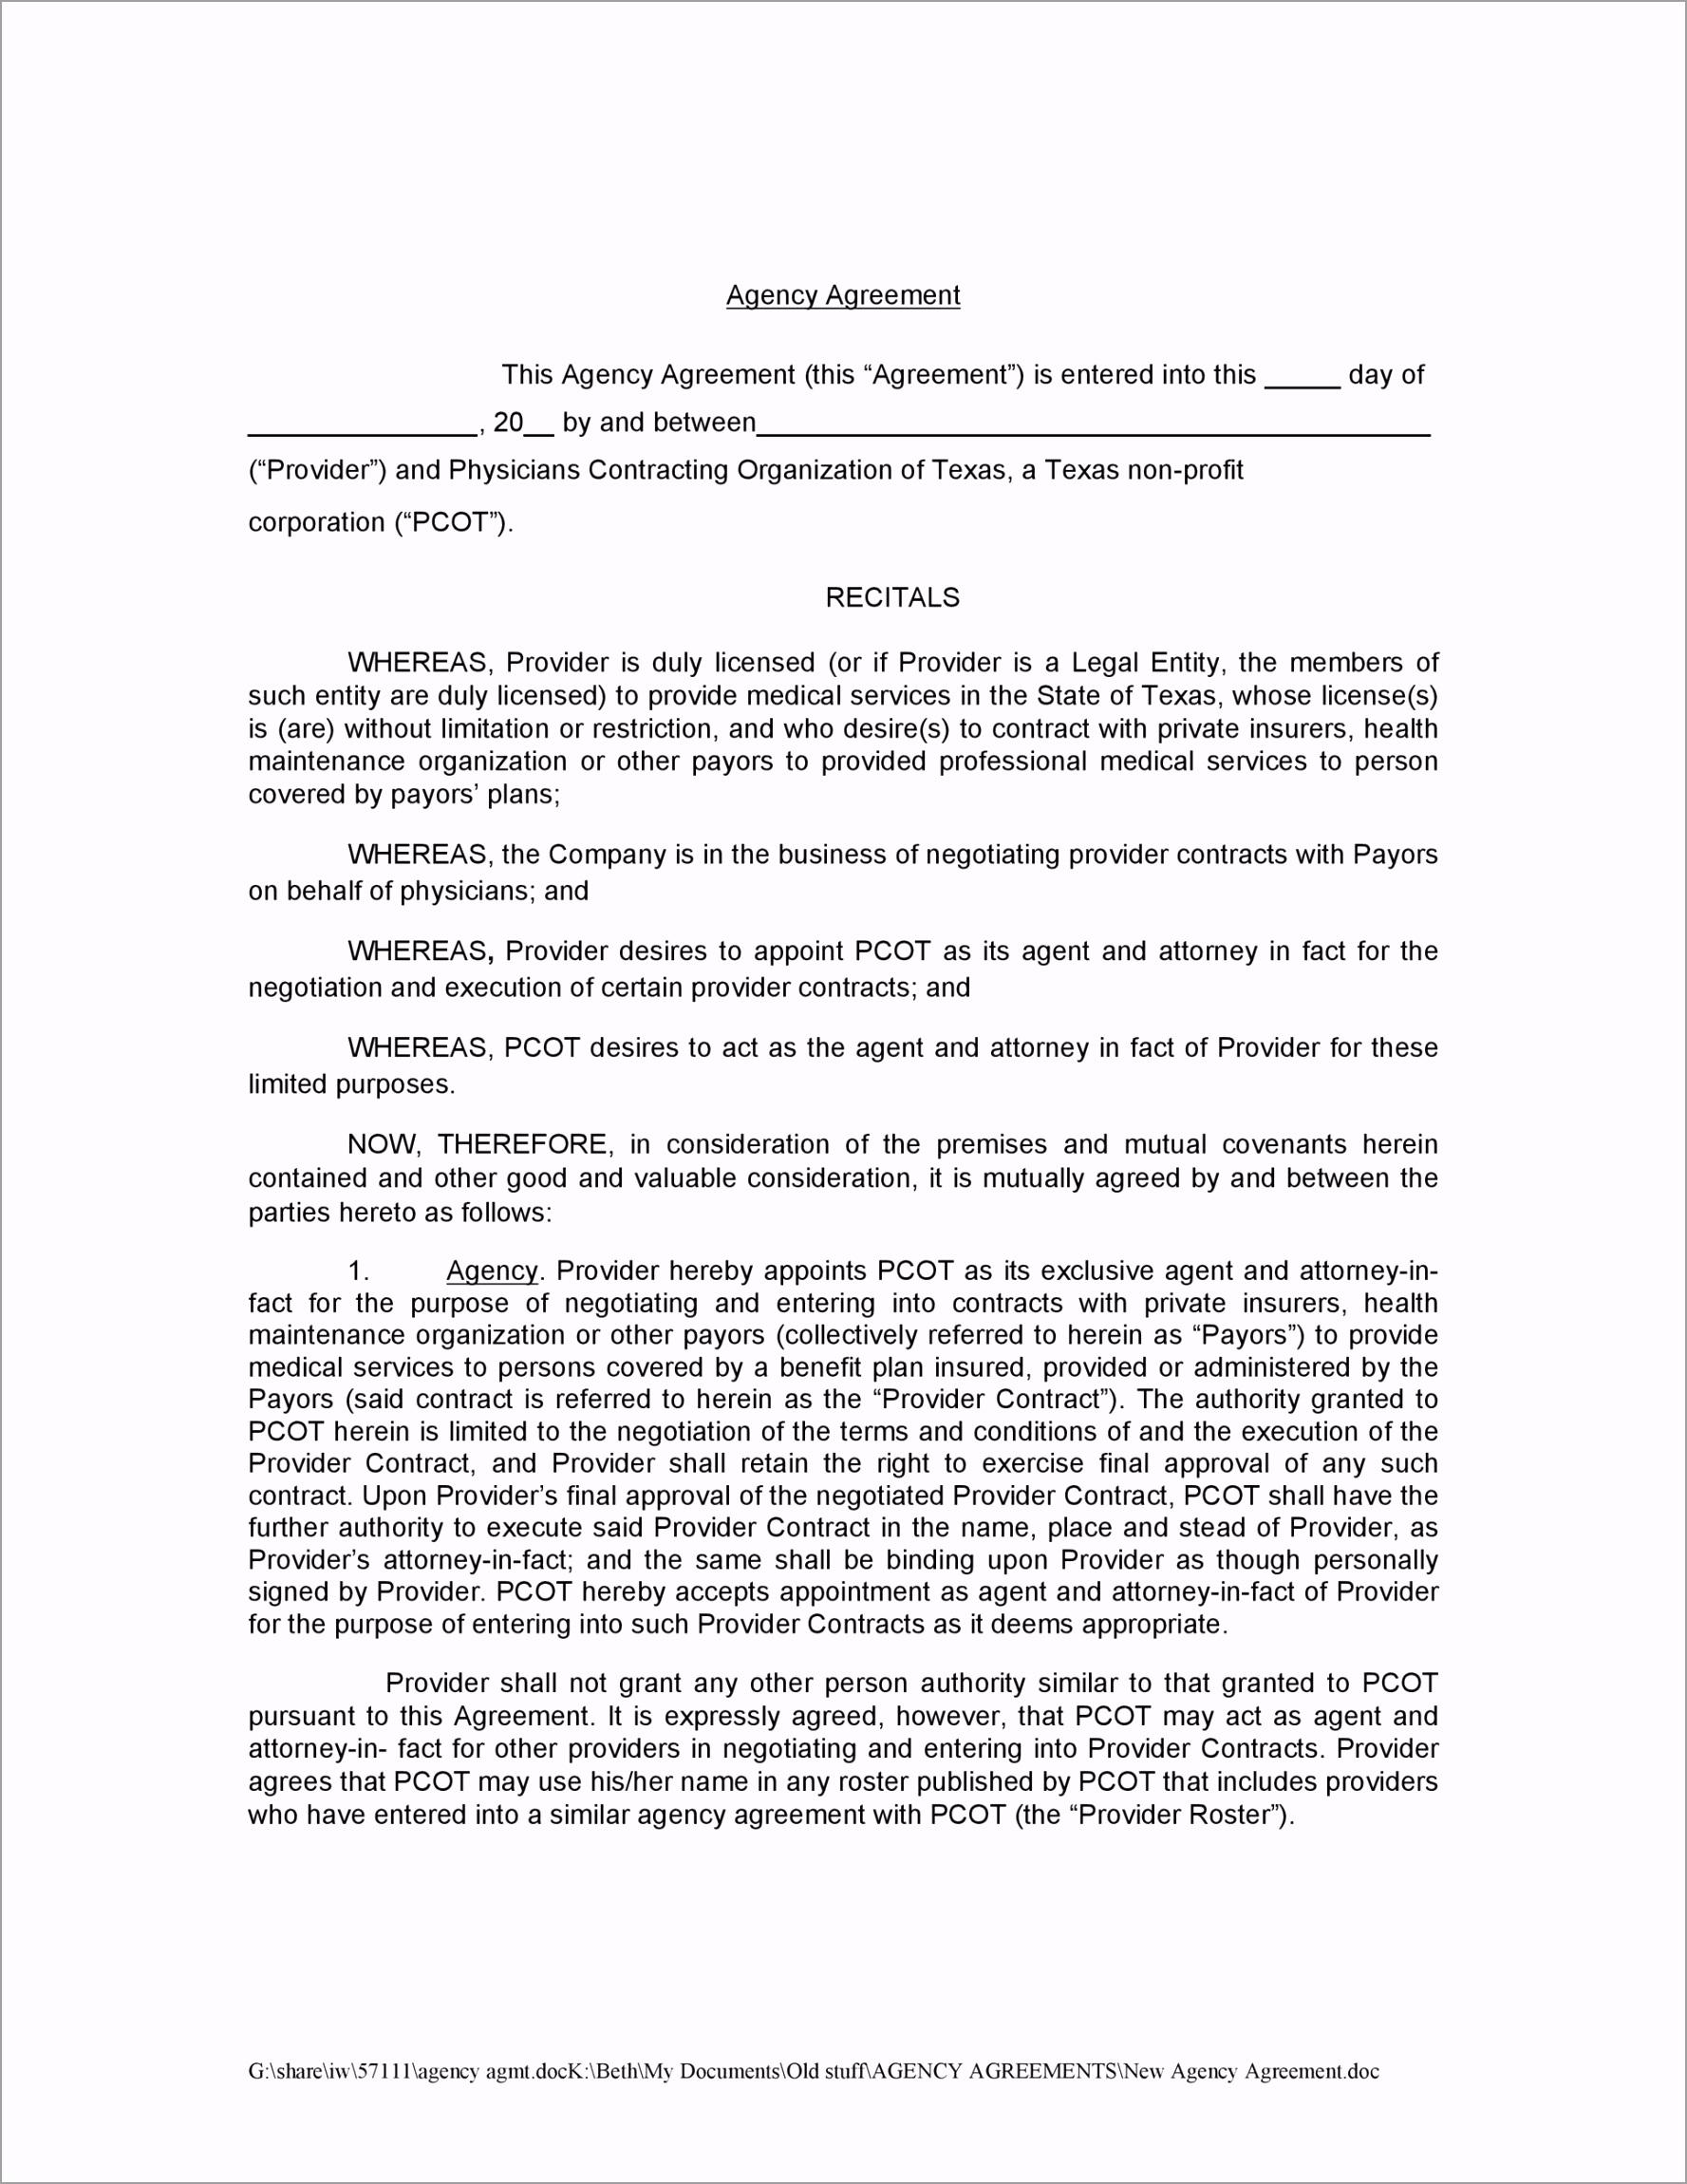 agency agreement 30 rtttp